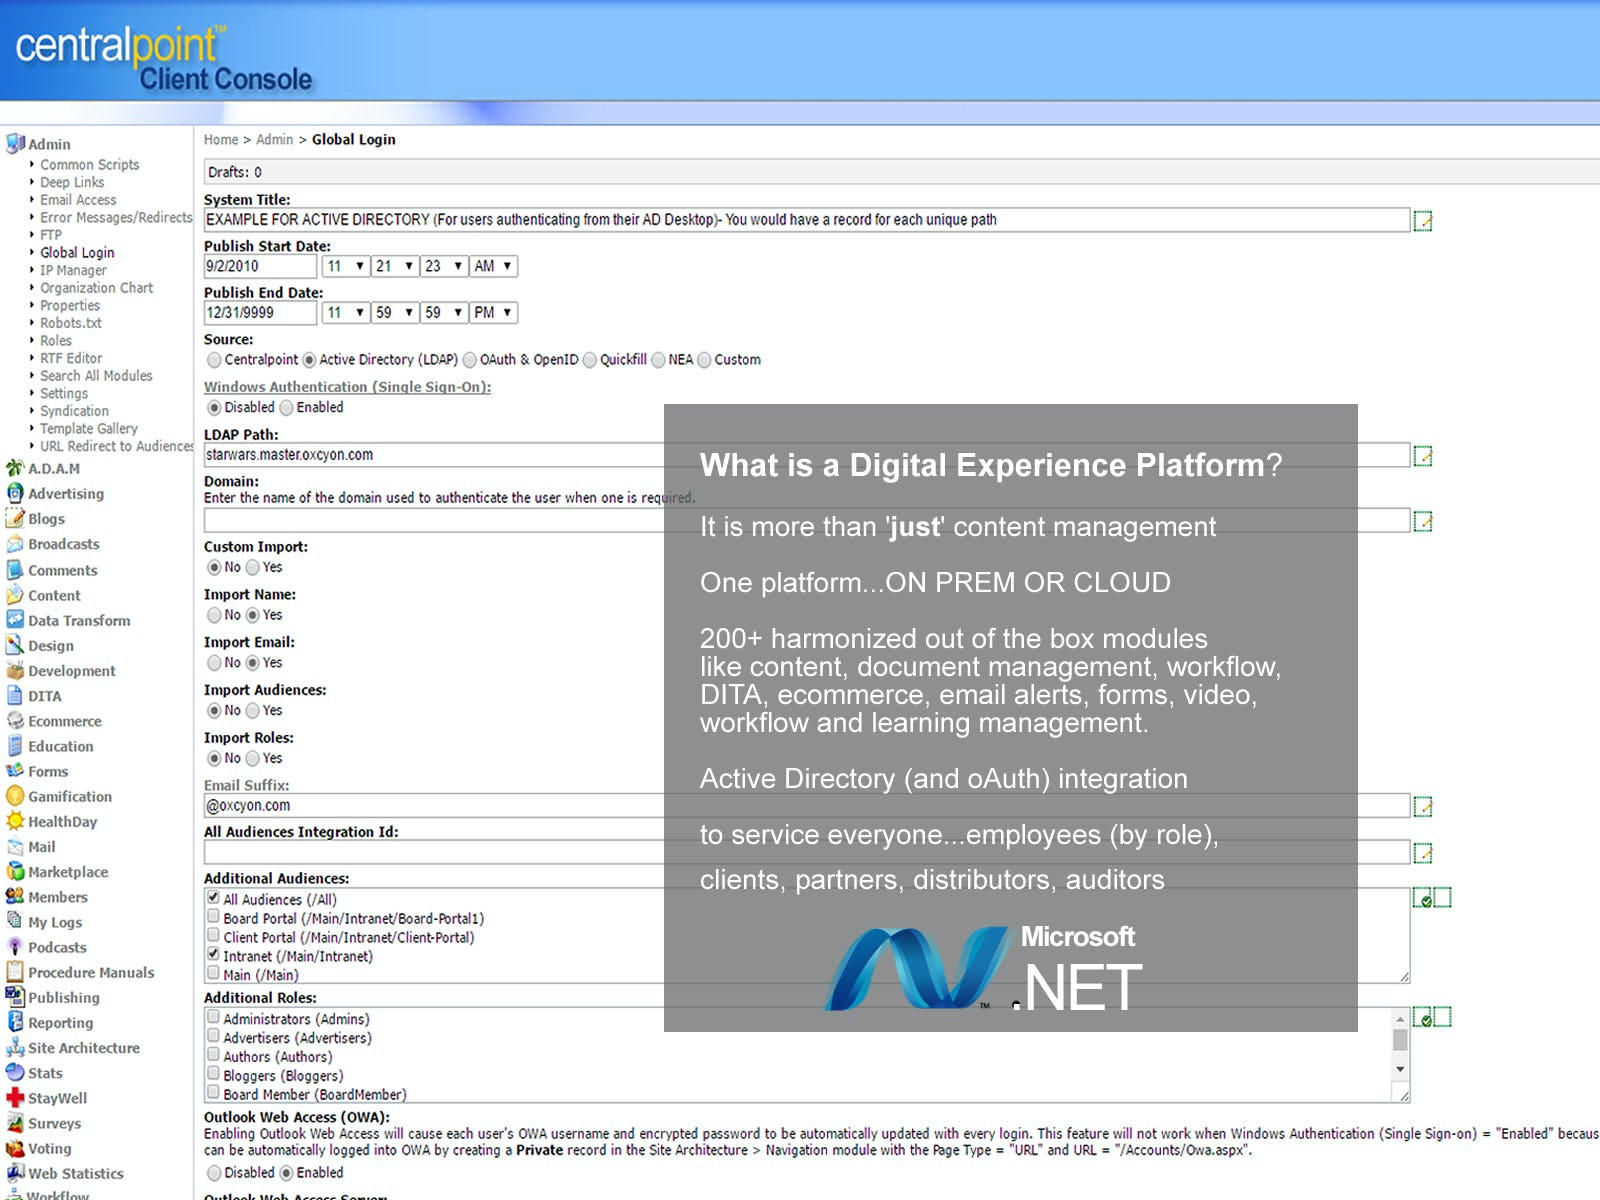 Centralpoint Software - Digital experience platform overview